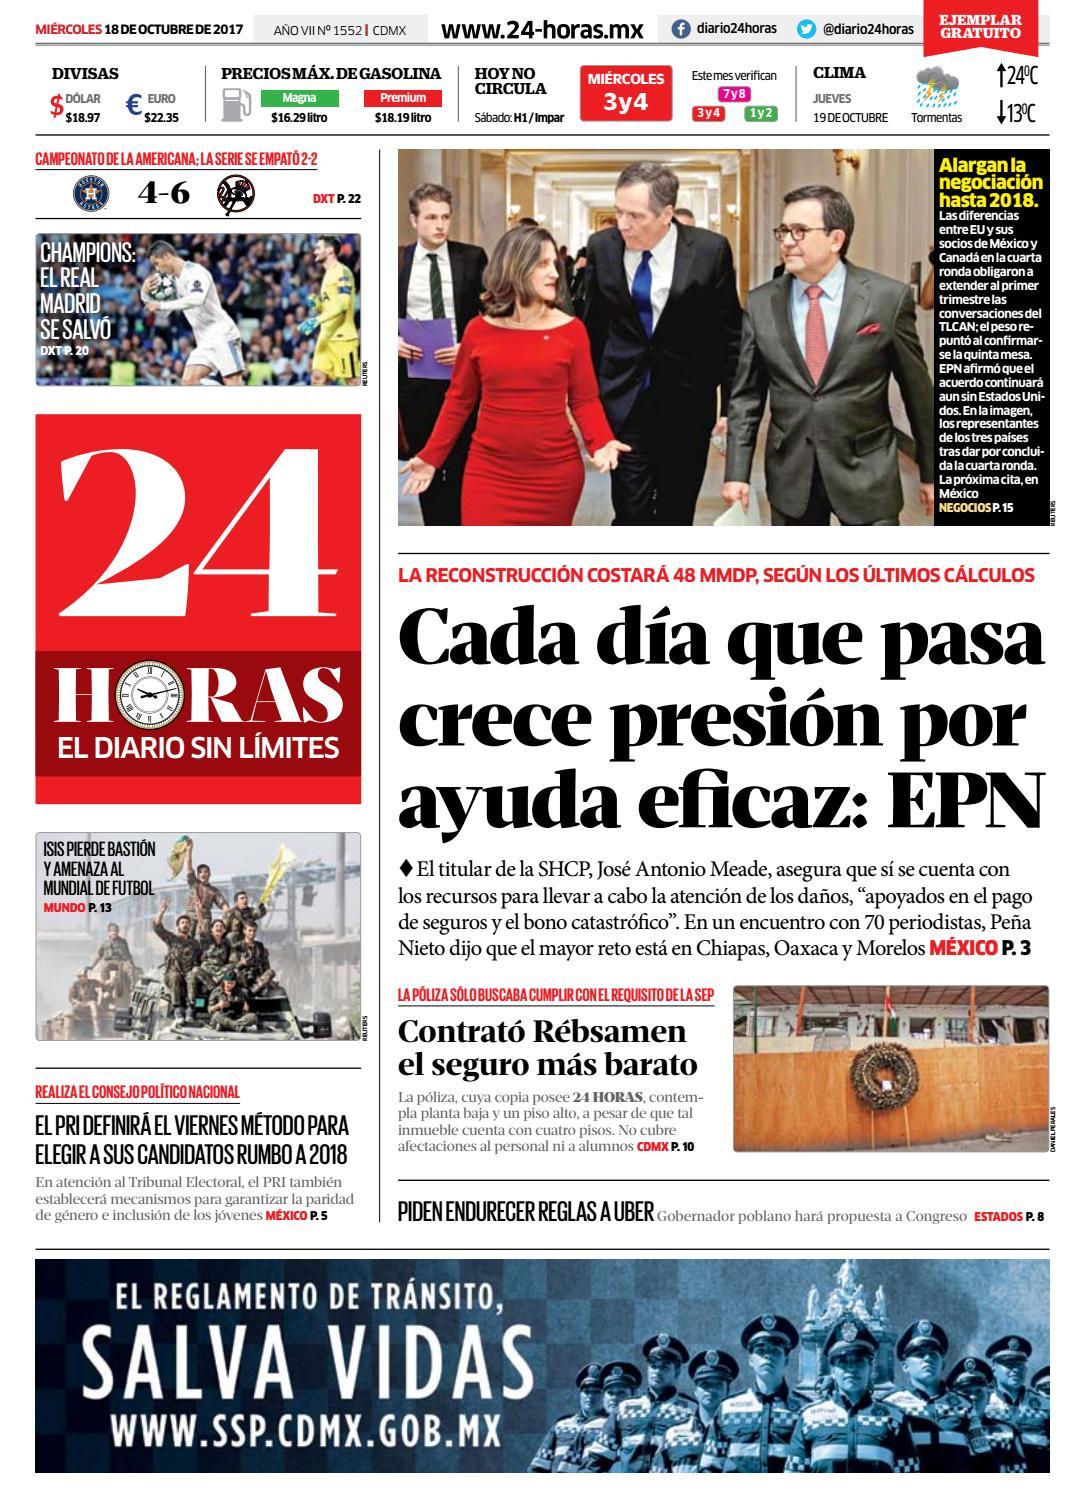 Octubre | 18 | 2017 by Información Integral 24/7 SAPI de C.V. - issuu